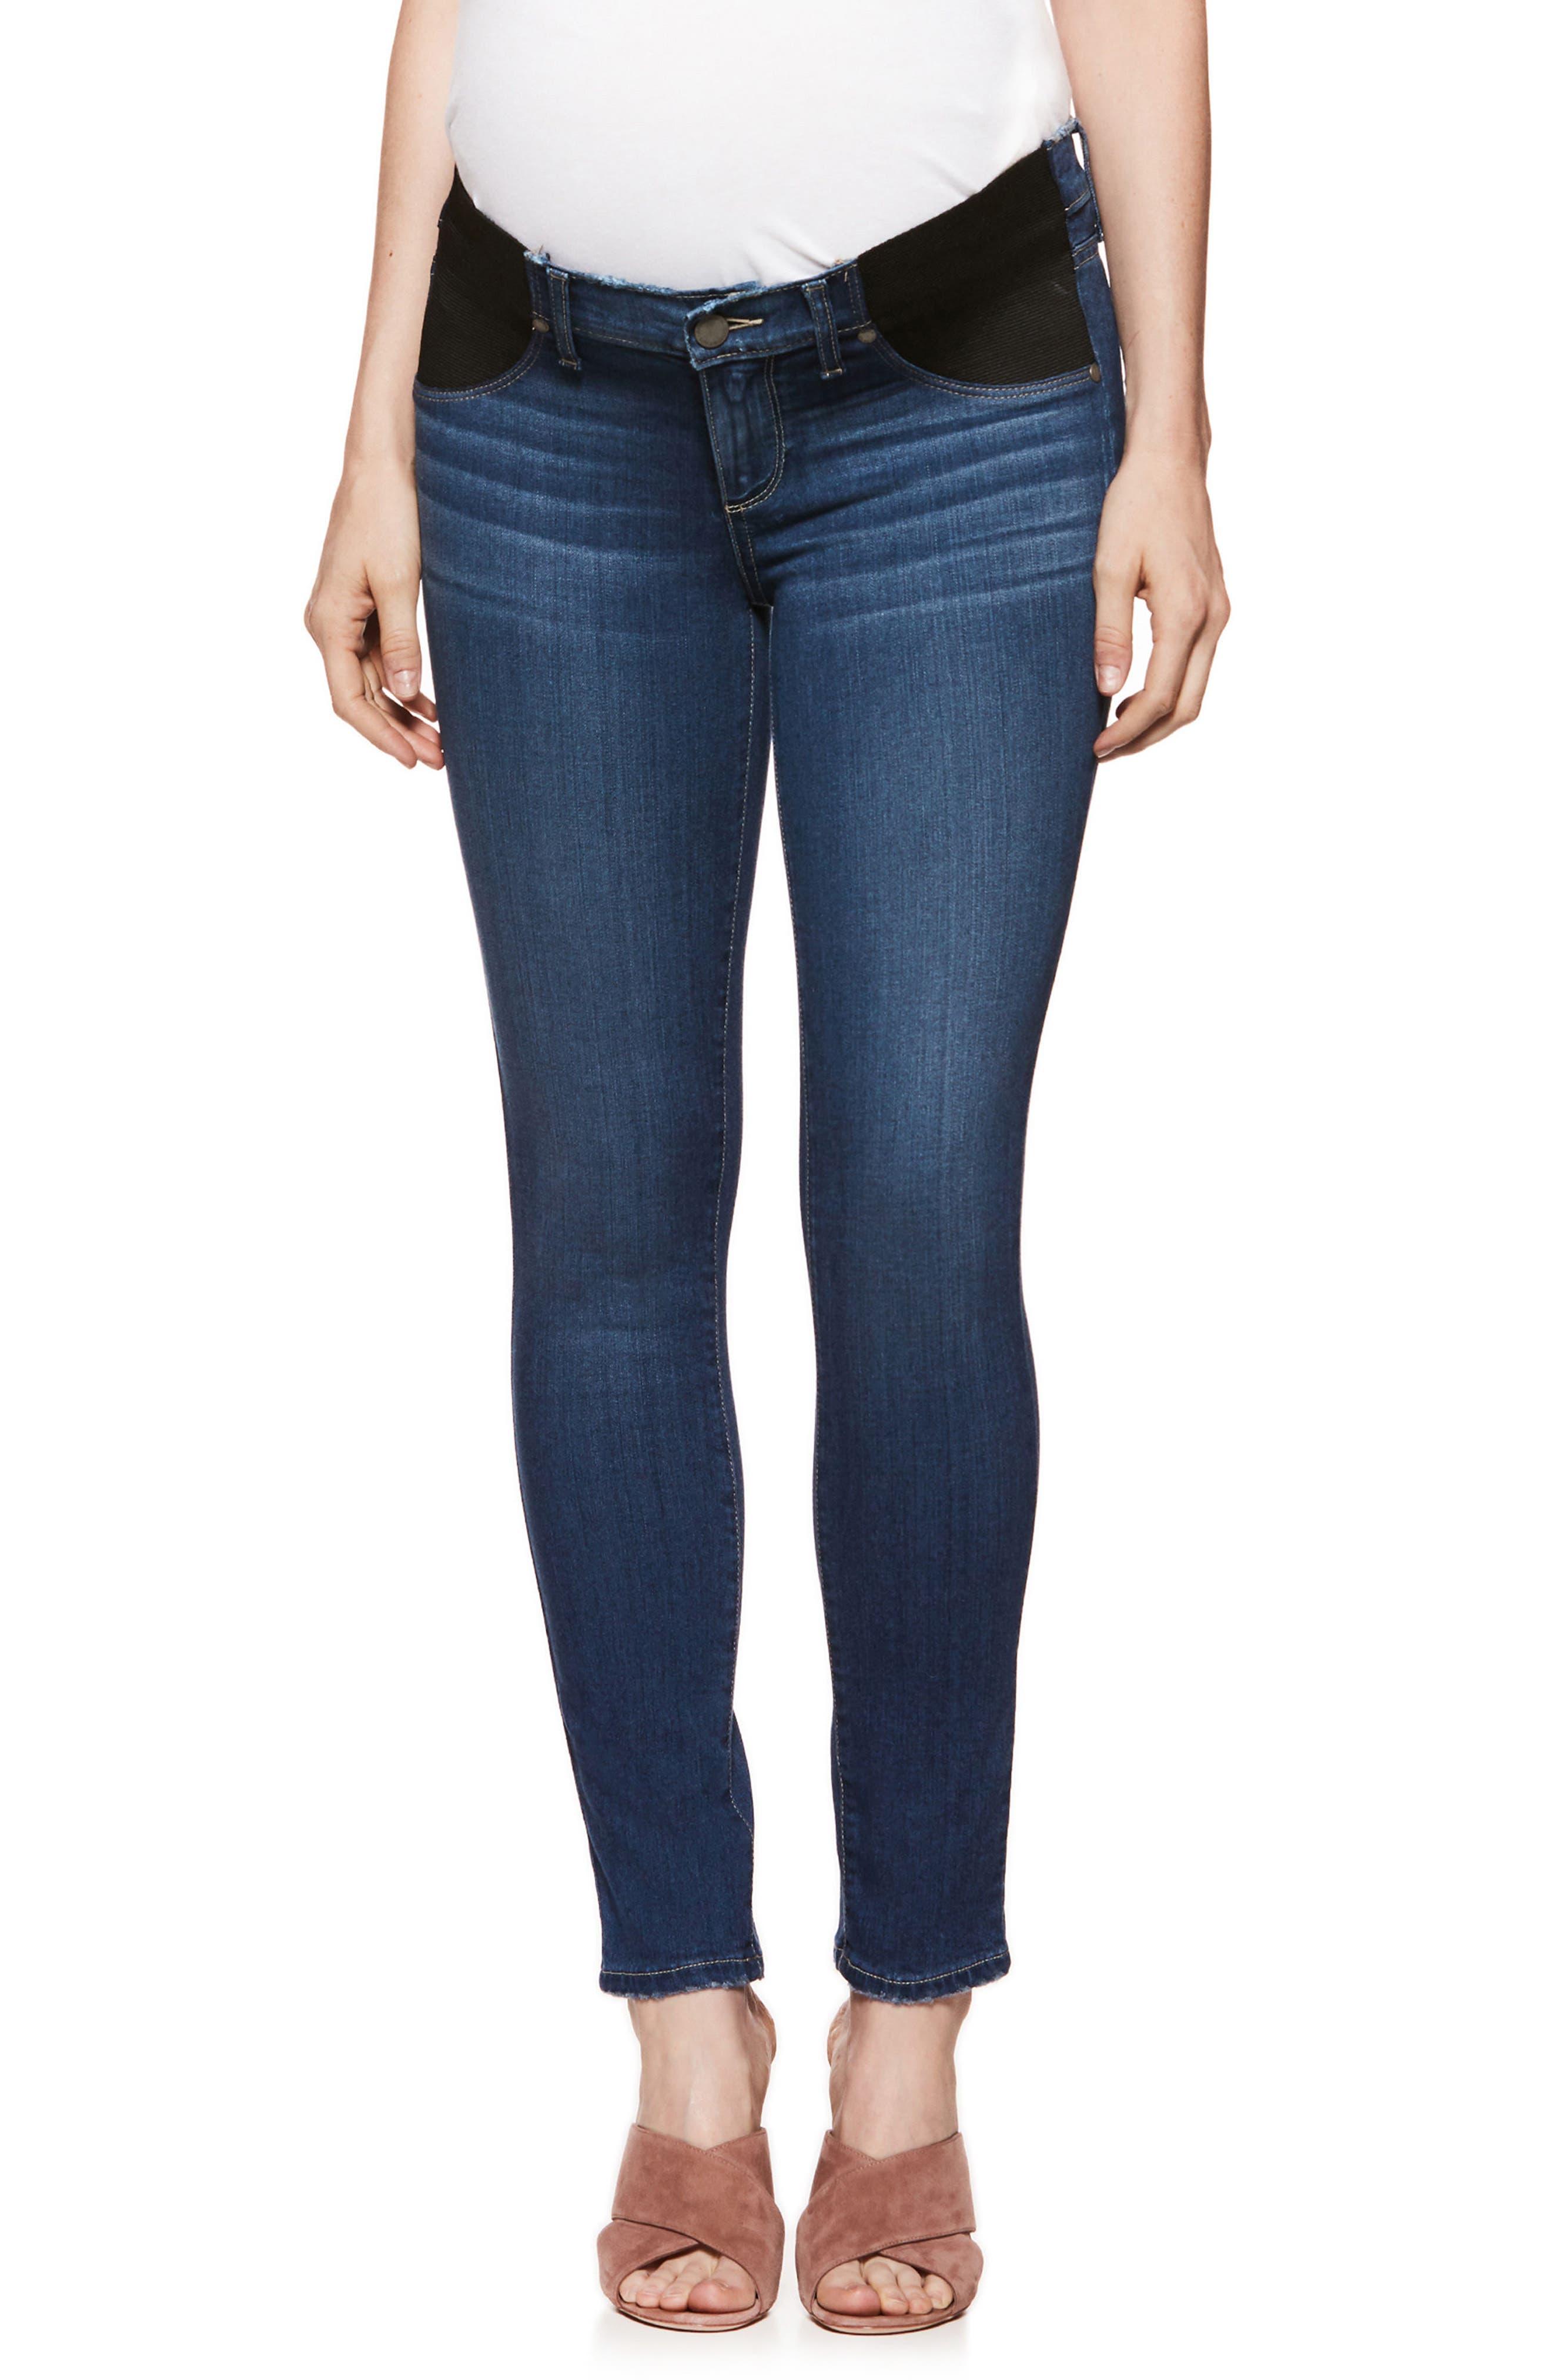 PAIGE Transcend - Verdugo Ultra Skinny Maternity Jeans, Main, color, 400